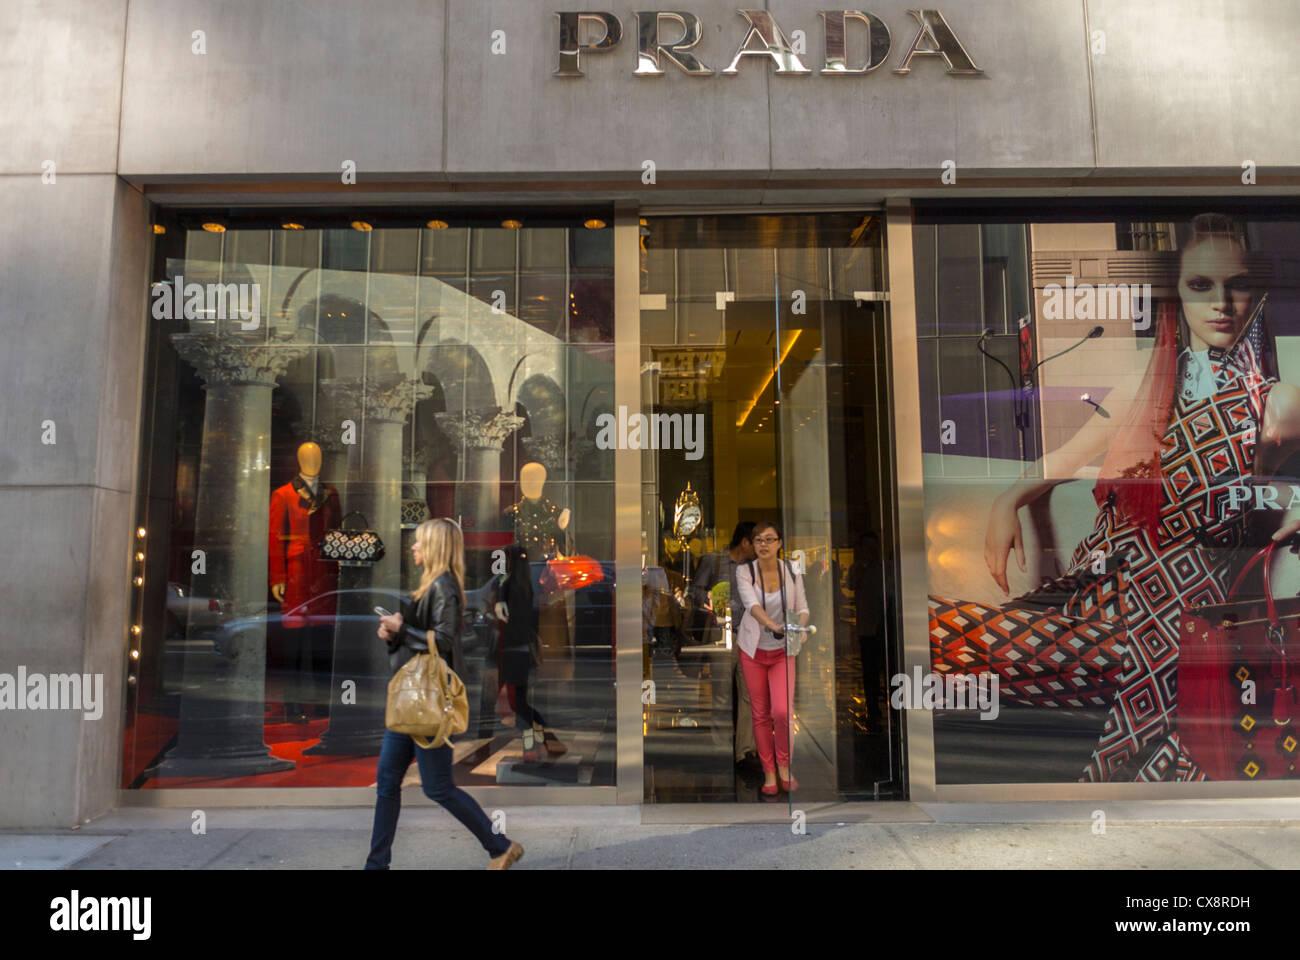 new york city ny usa frau einkaufen stra enszenen luxus mode marken shops prada auf fifth. Black Bedroom Furniture Sets. Home Design Ideas